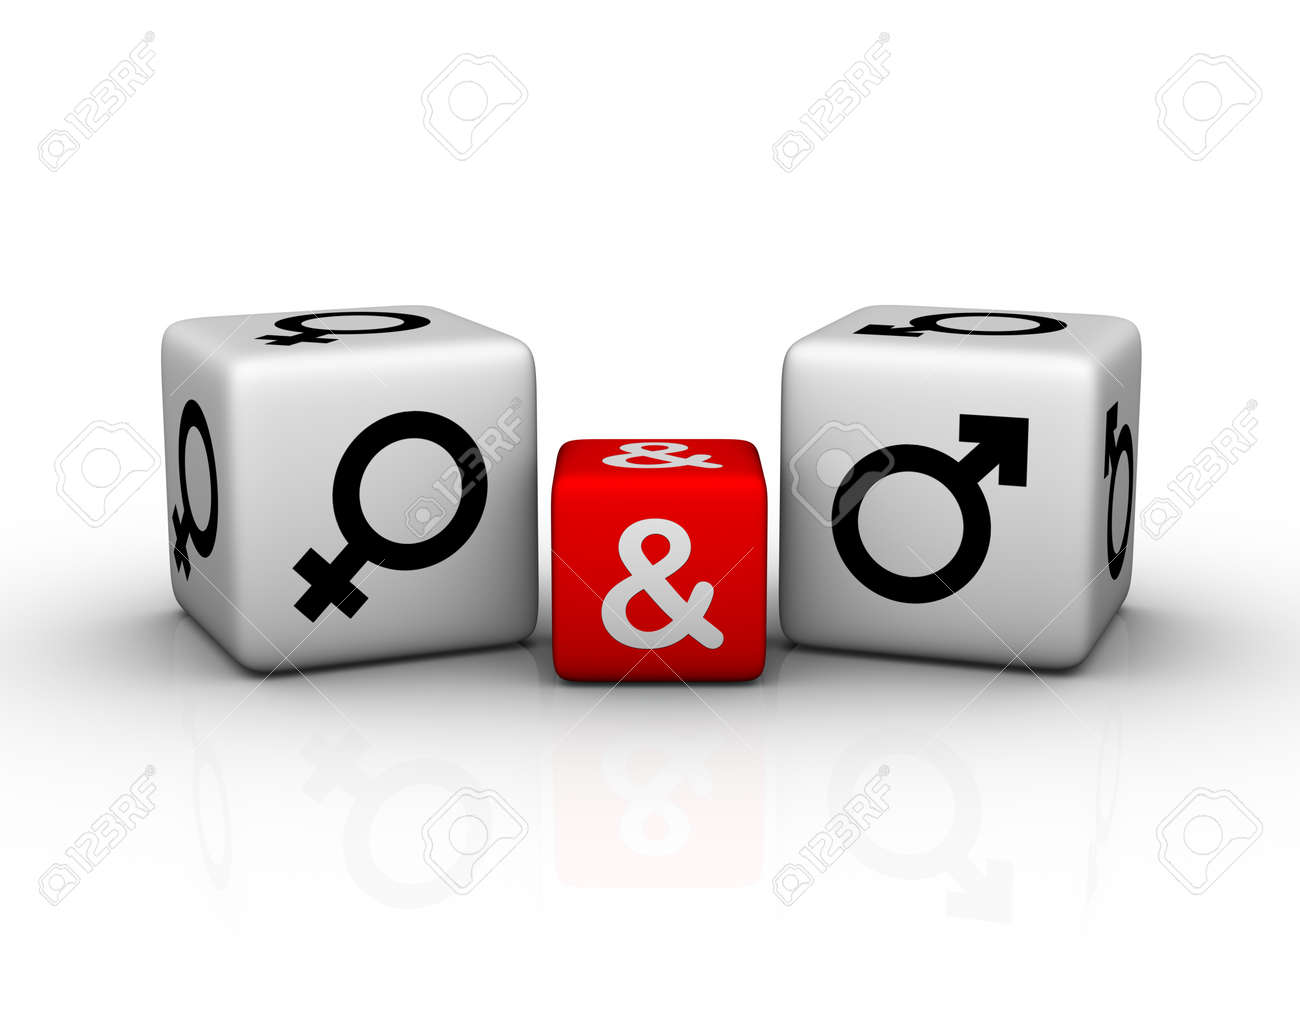 female and male symbol dice Stock Photo - 8773176